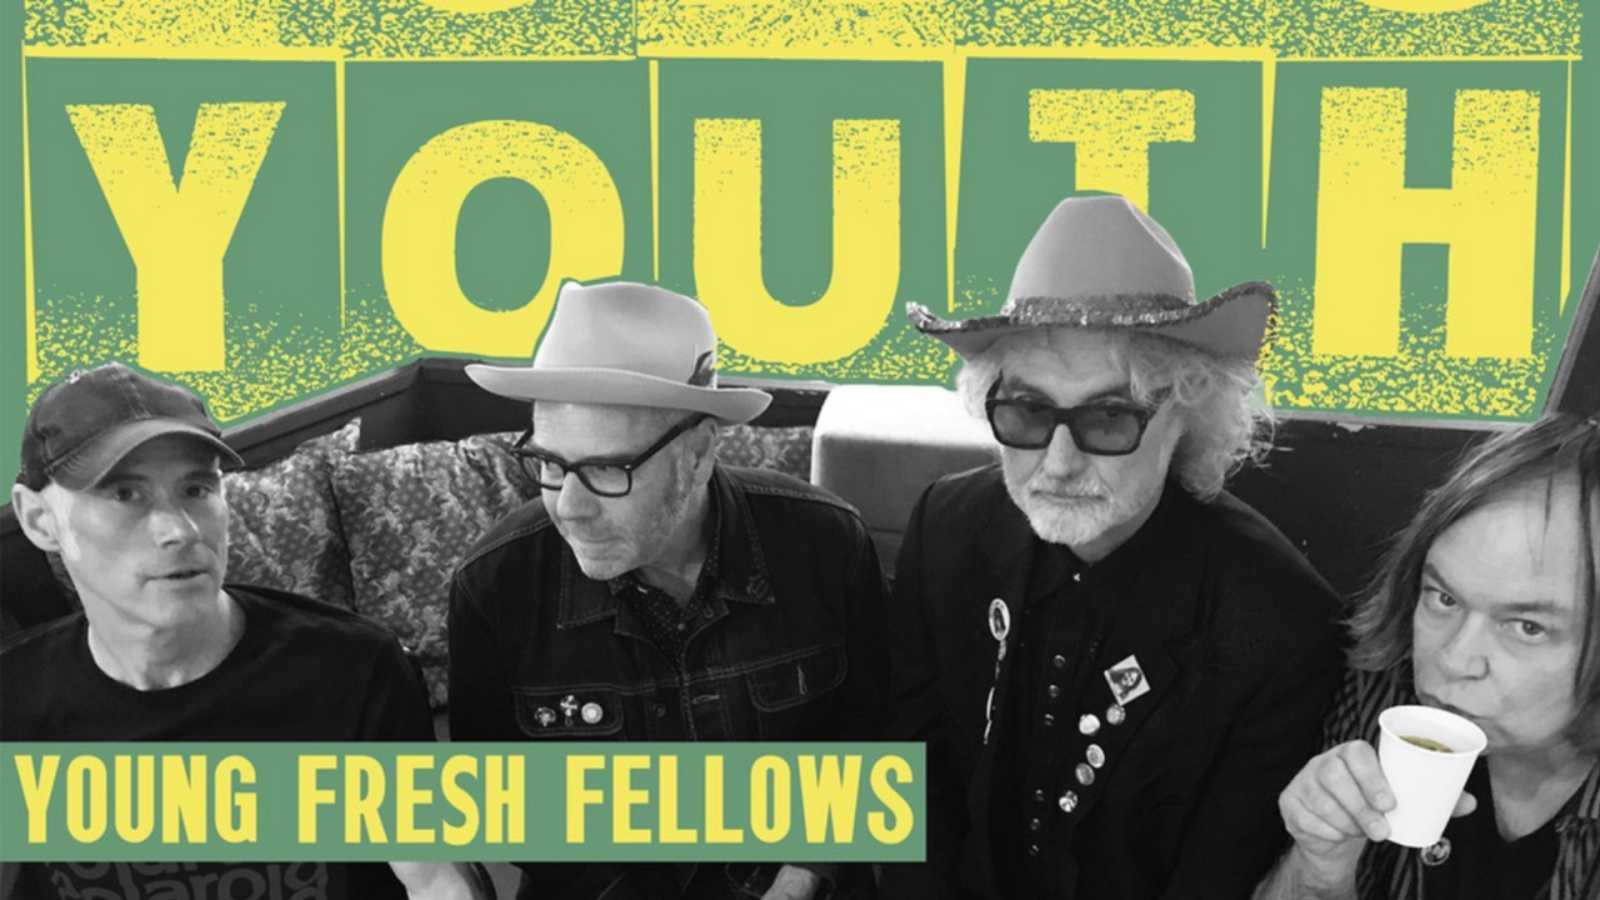 El sótano - Young Fresh Fellows, Schizophonics, Roxy Music, The Exits... - 24/11/20 - escuchar ahora